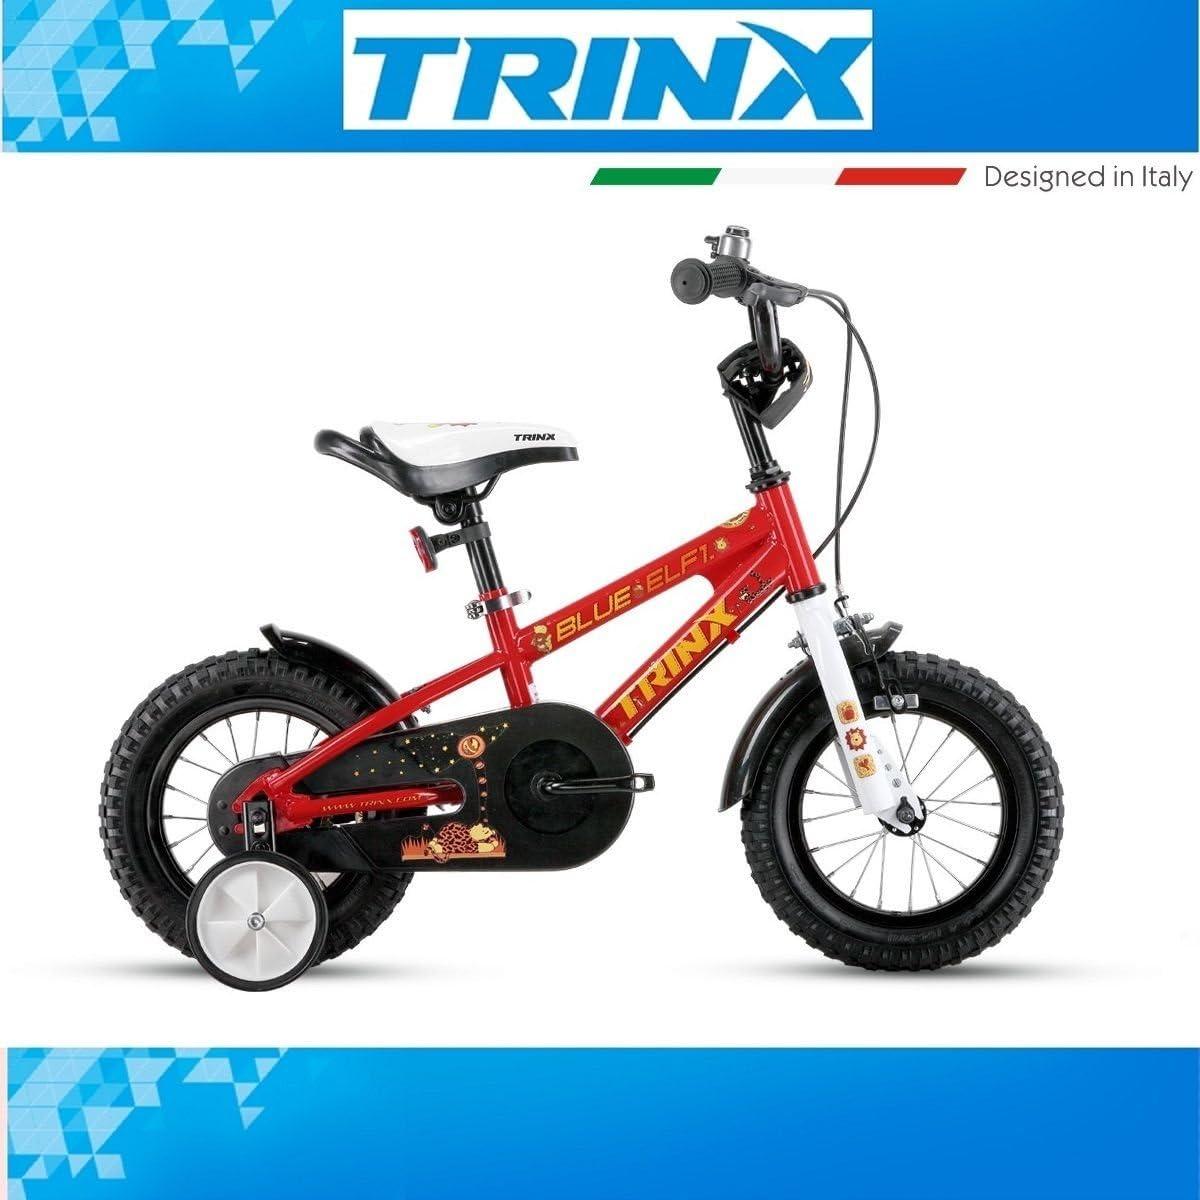 Bicicleta Niños trinx Blue Elf 1.0 Rojo 12 pulgadas ruedines cesta ...